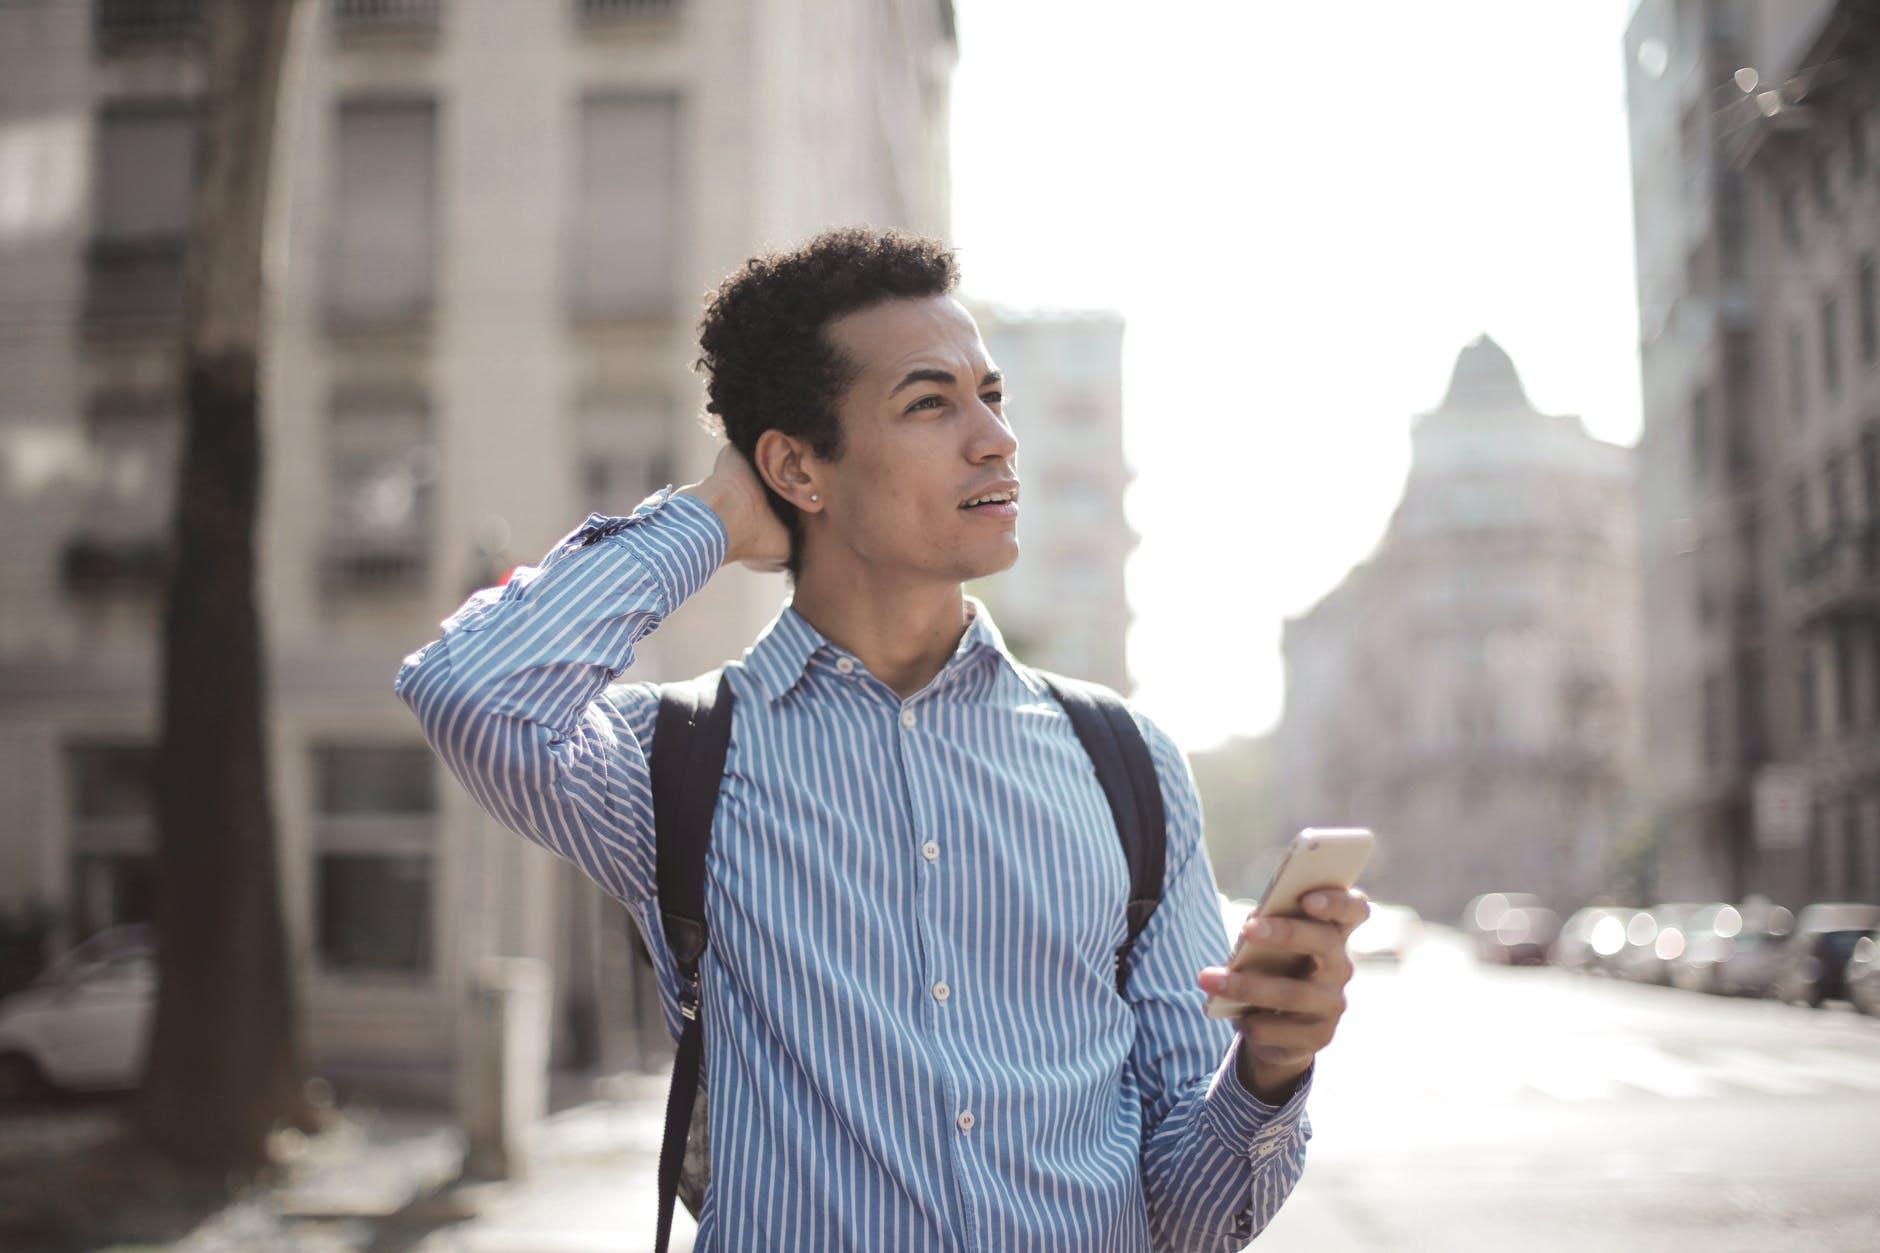 thoughtful man using smartphone on street